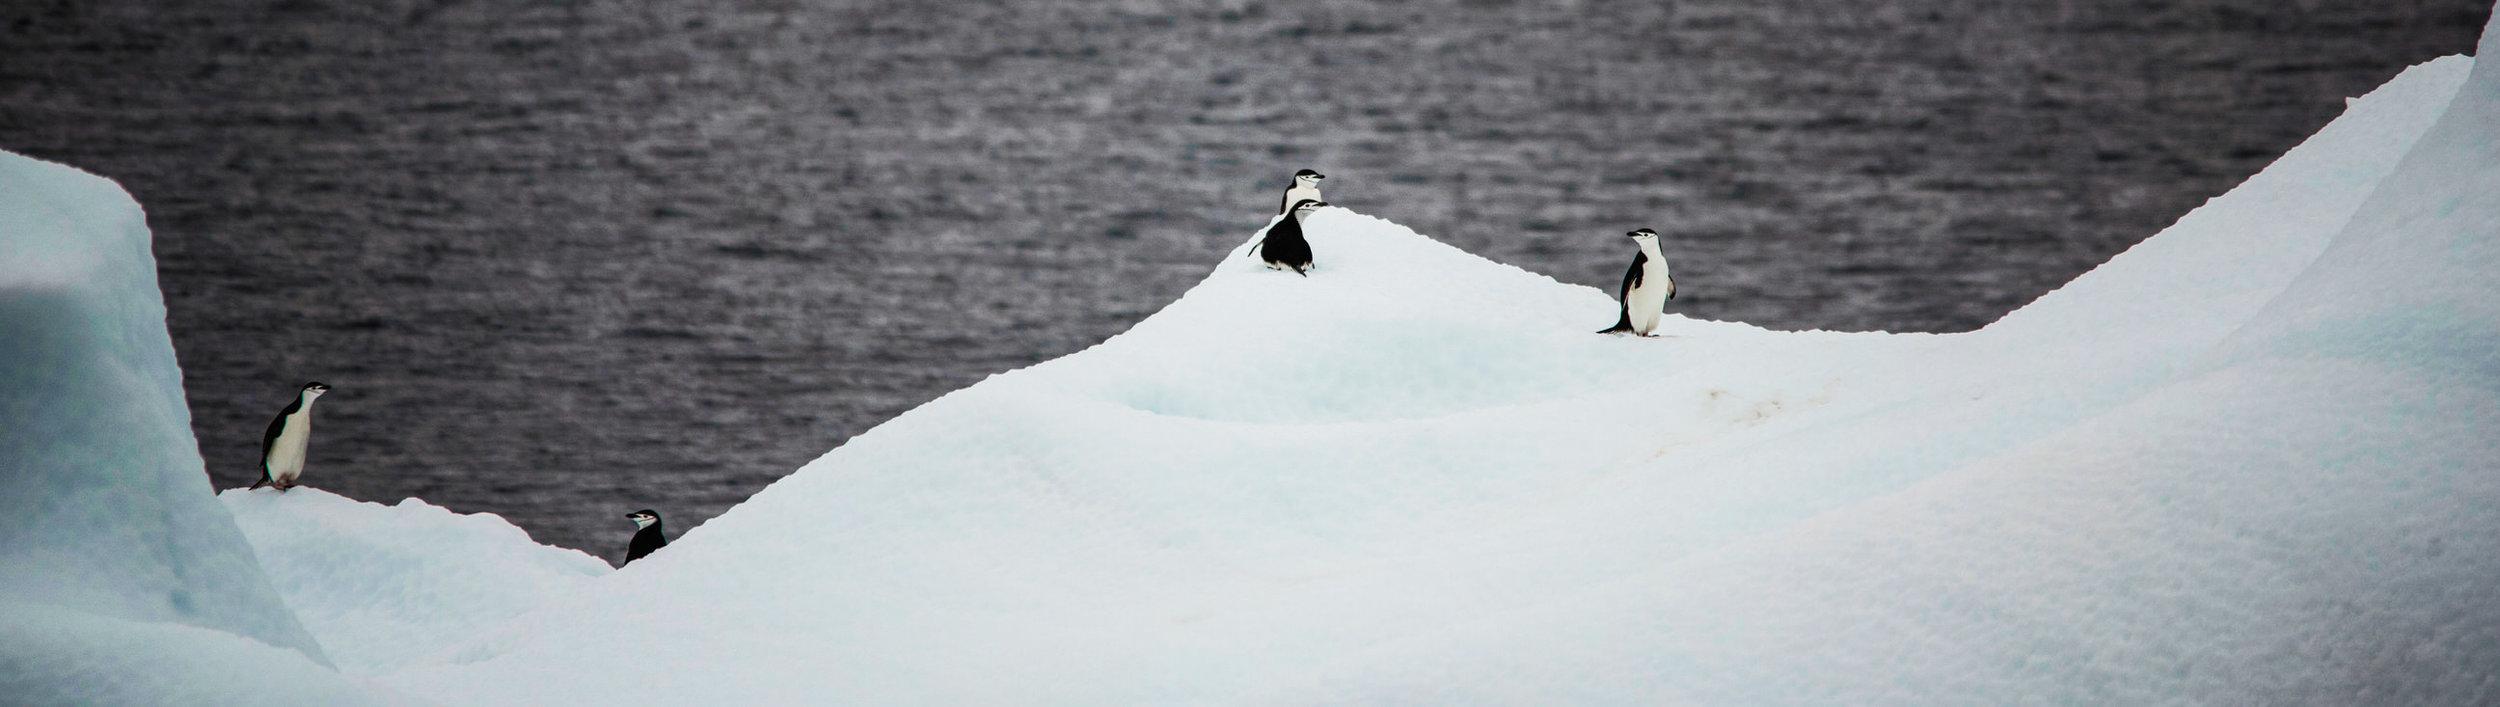 KathleenHertelPhotography-AntarcticaLandscapes-115.JPG